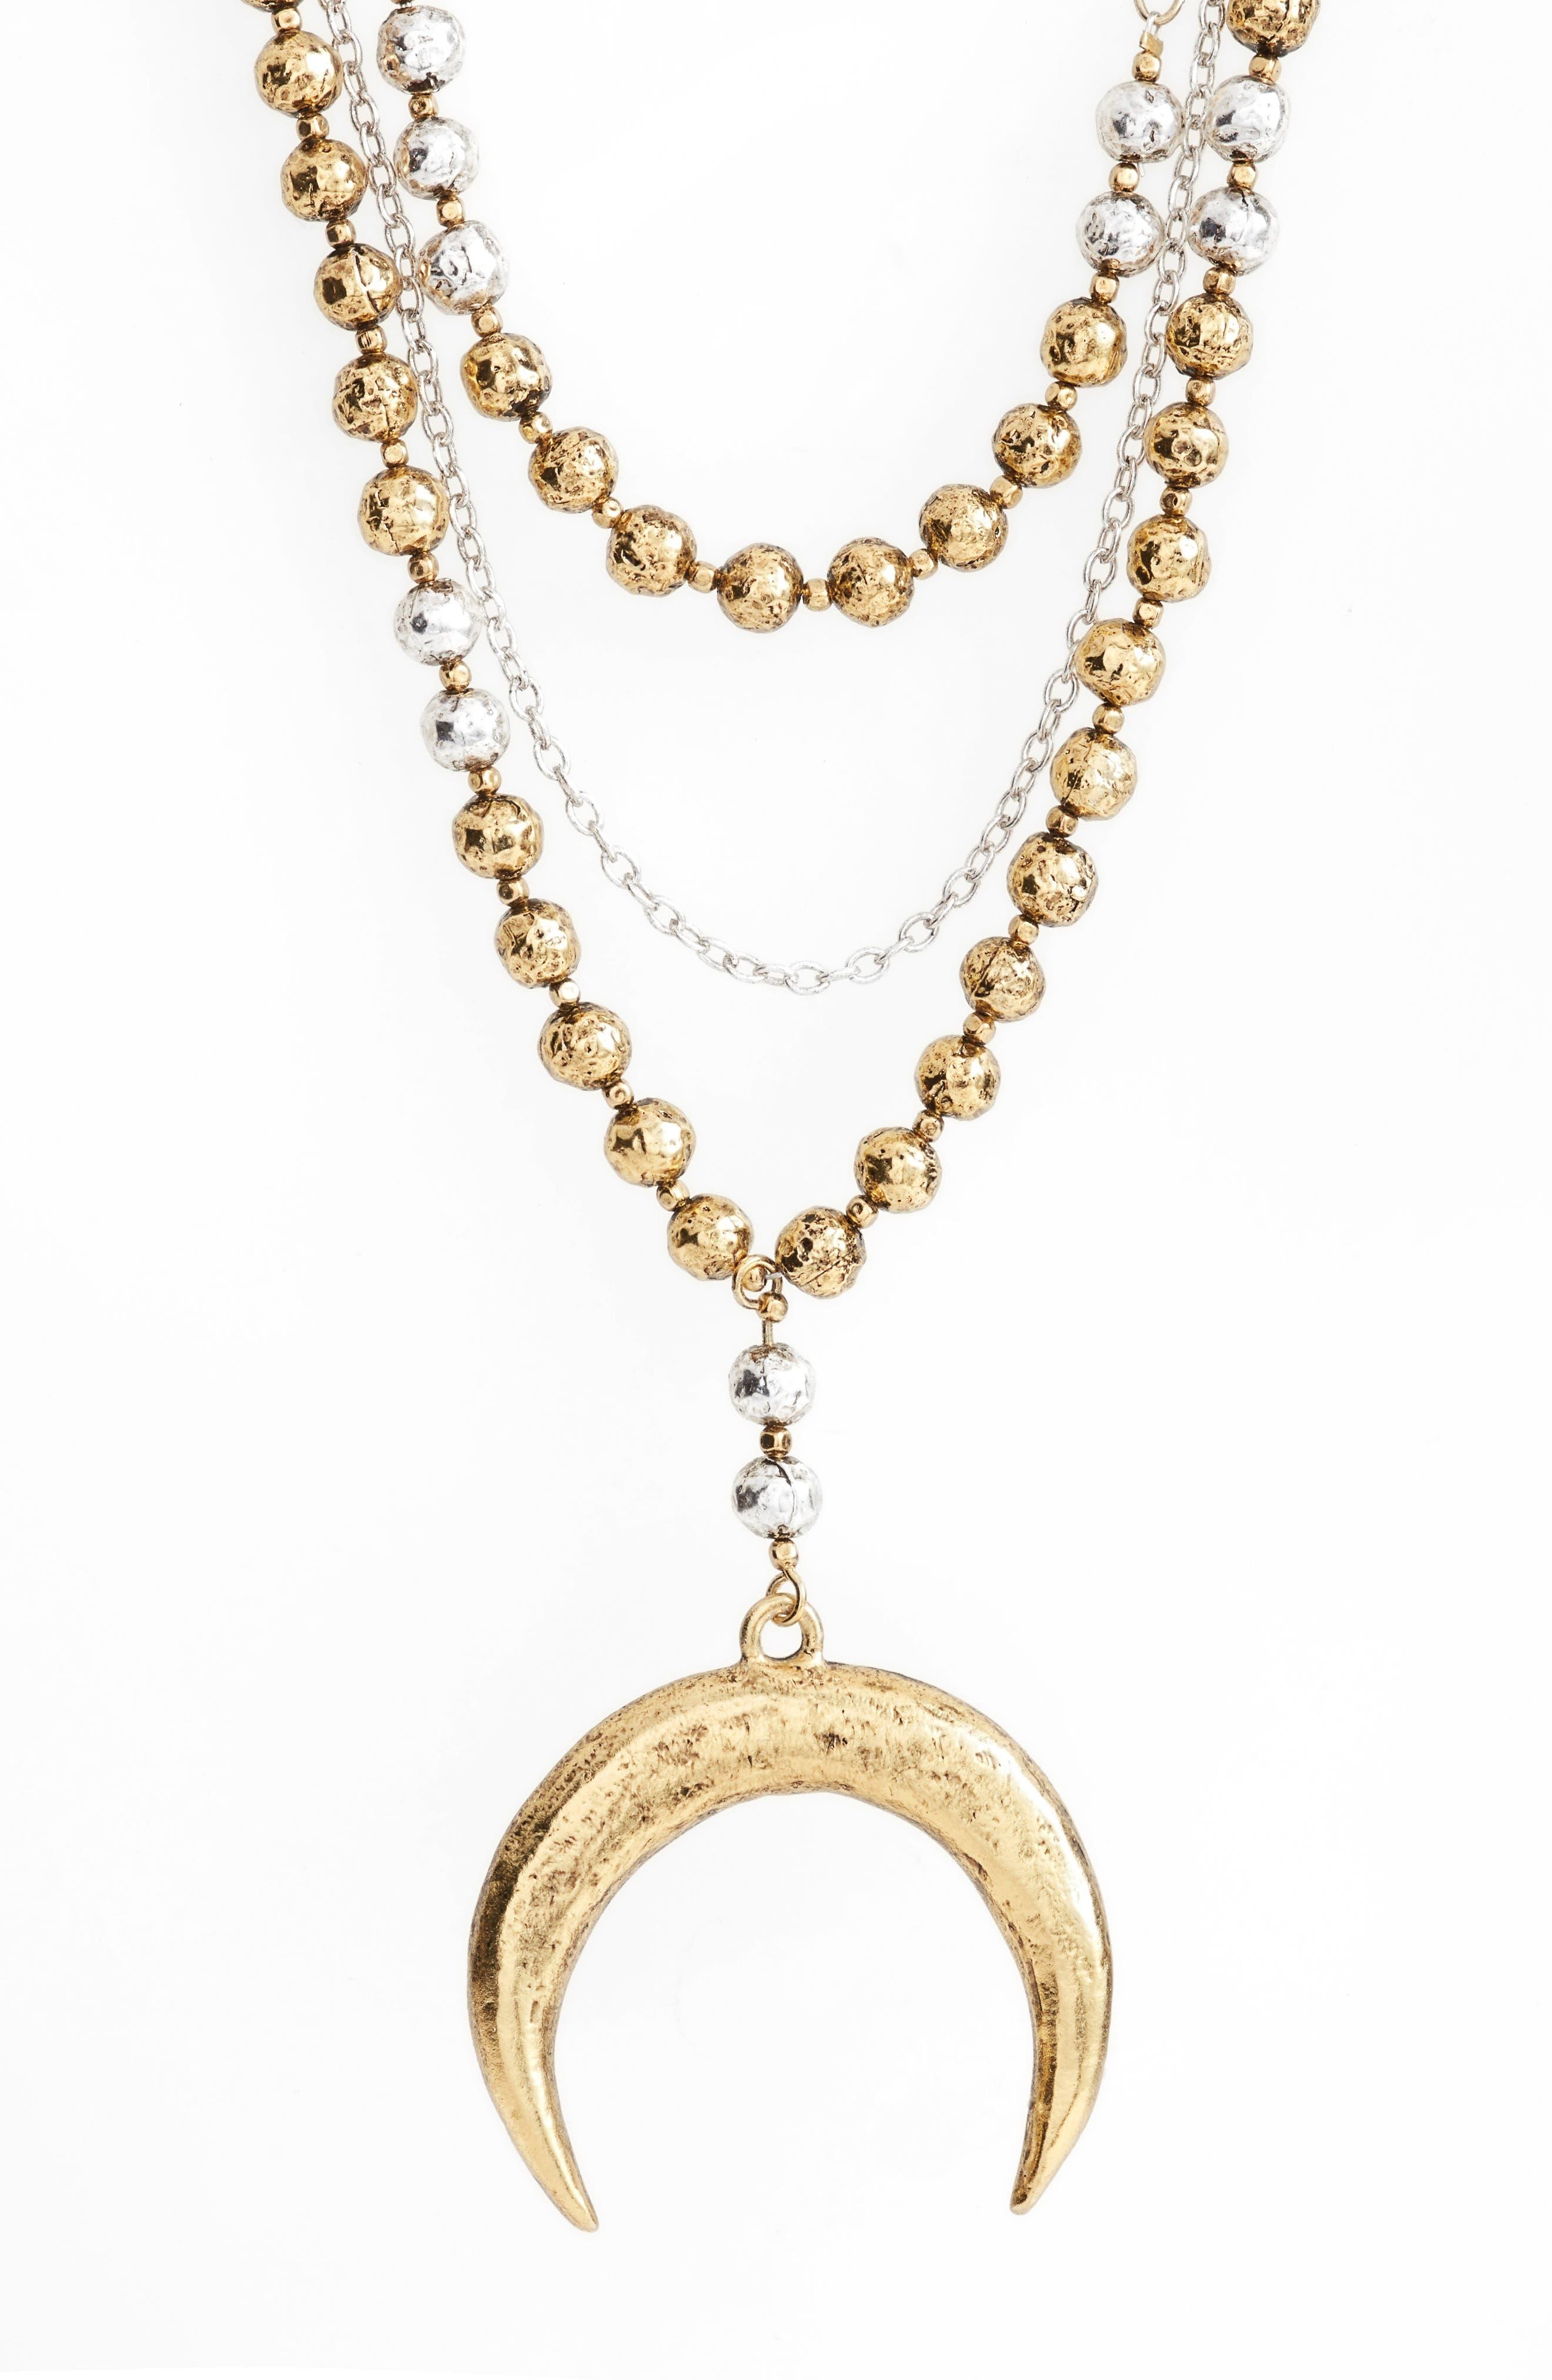 Multistrand Pandant Necklace,                             Alternate thumbnail 2, color,                             GOLD/SILVER MIX